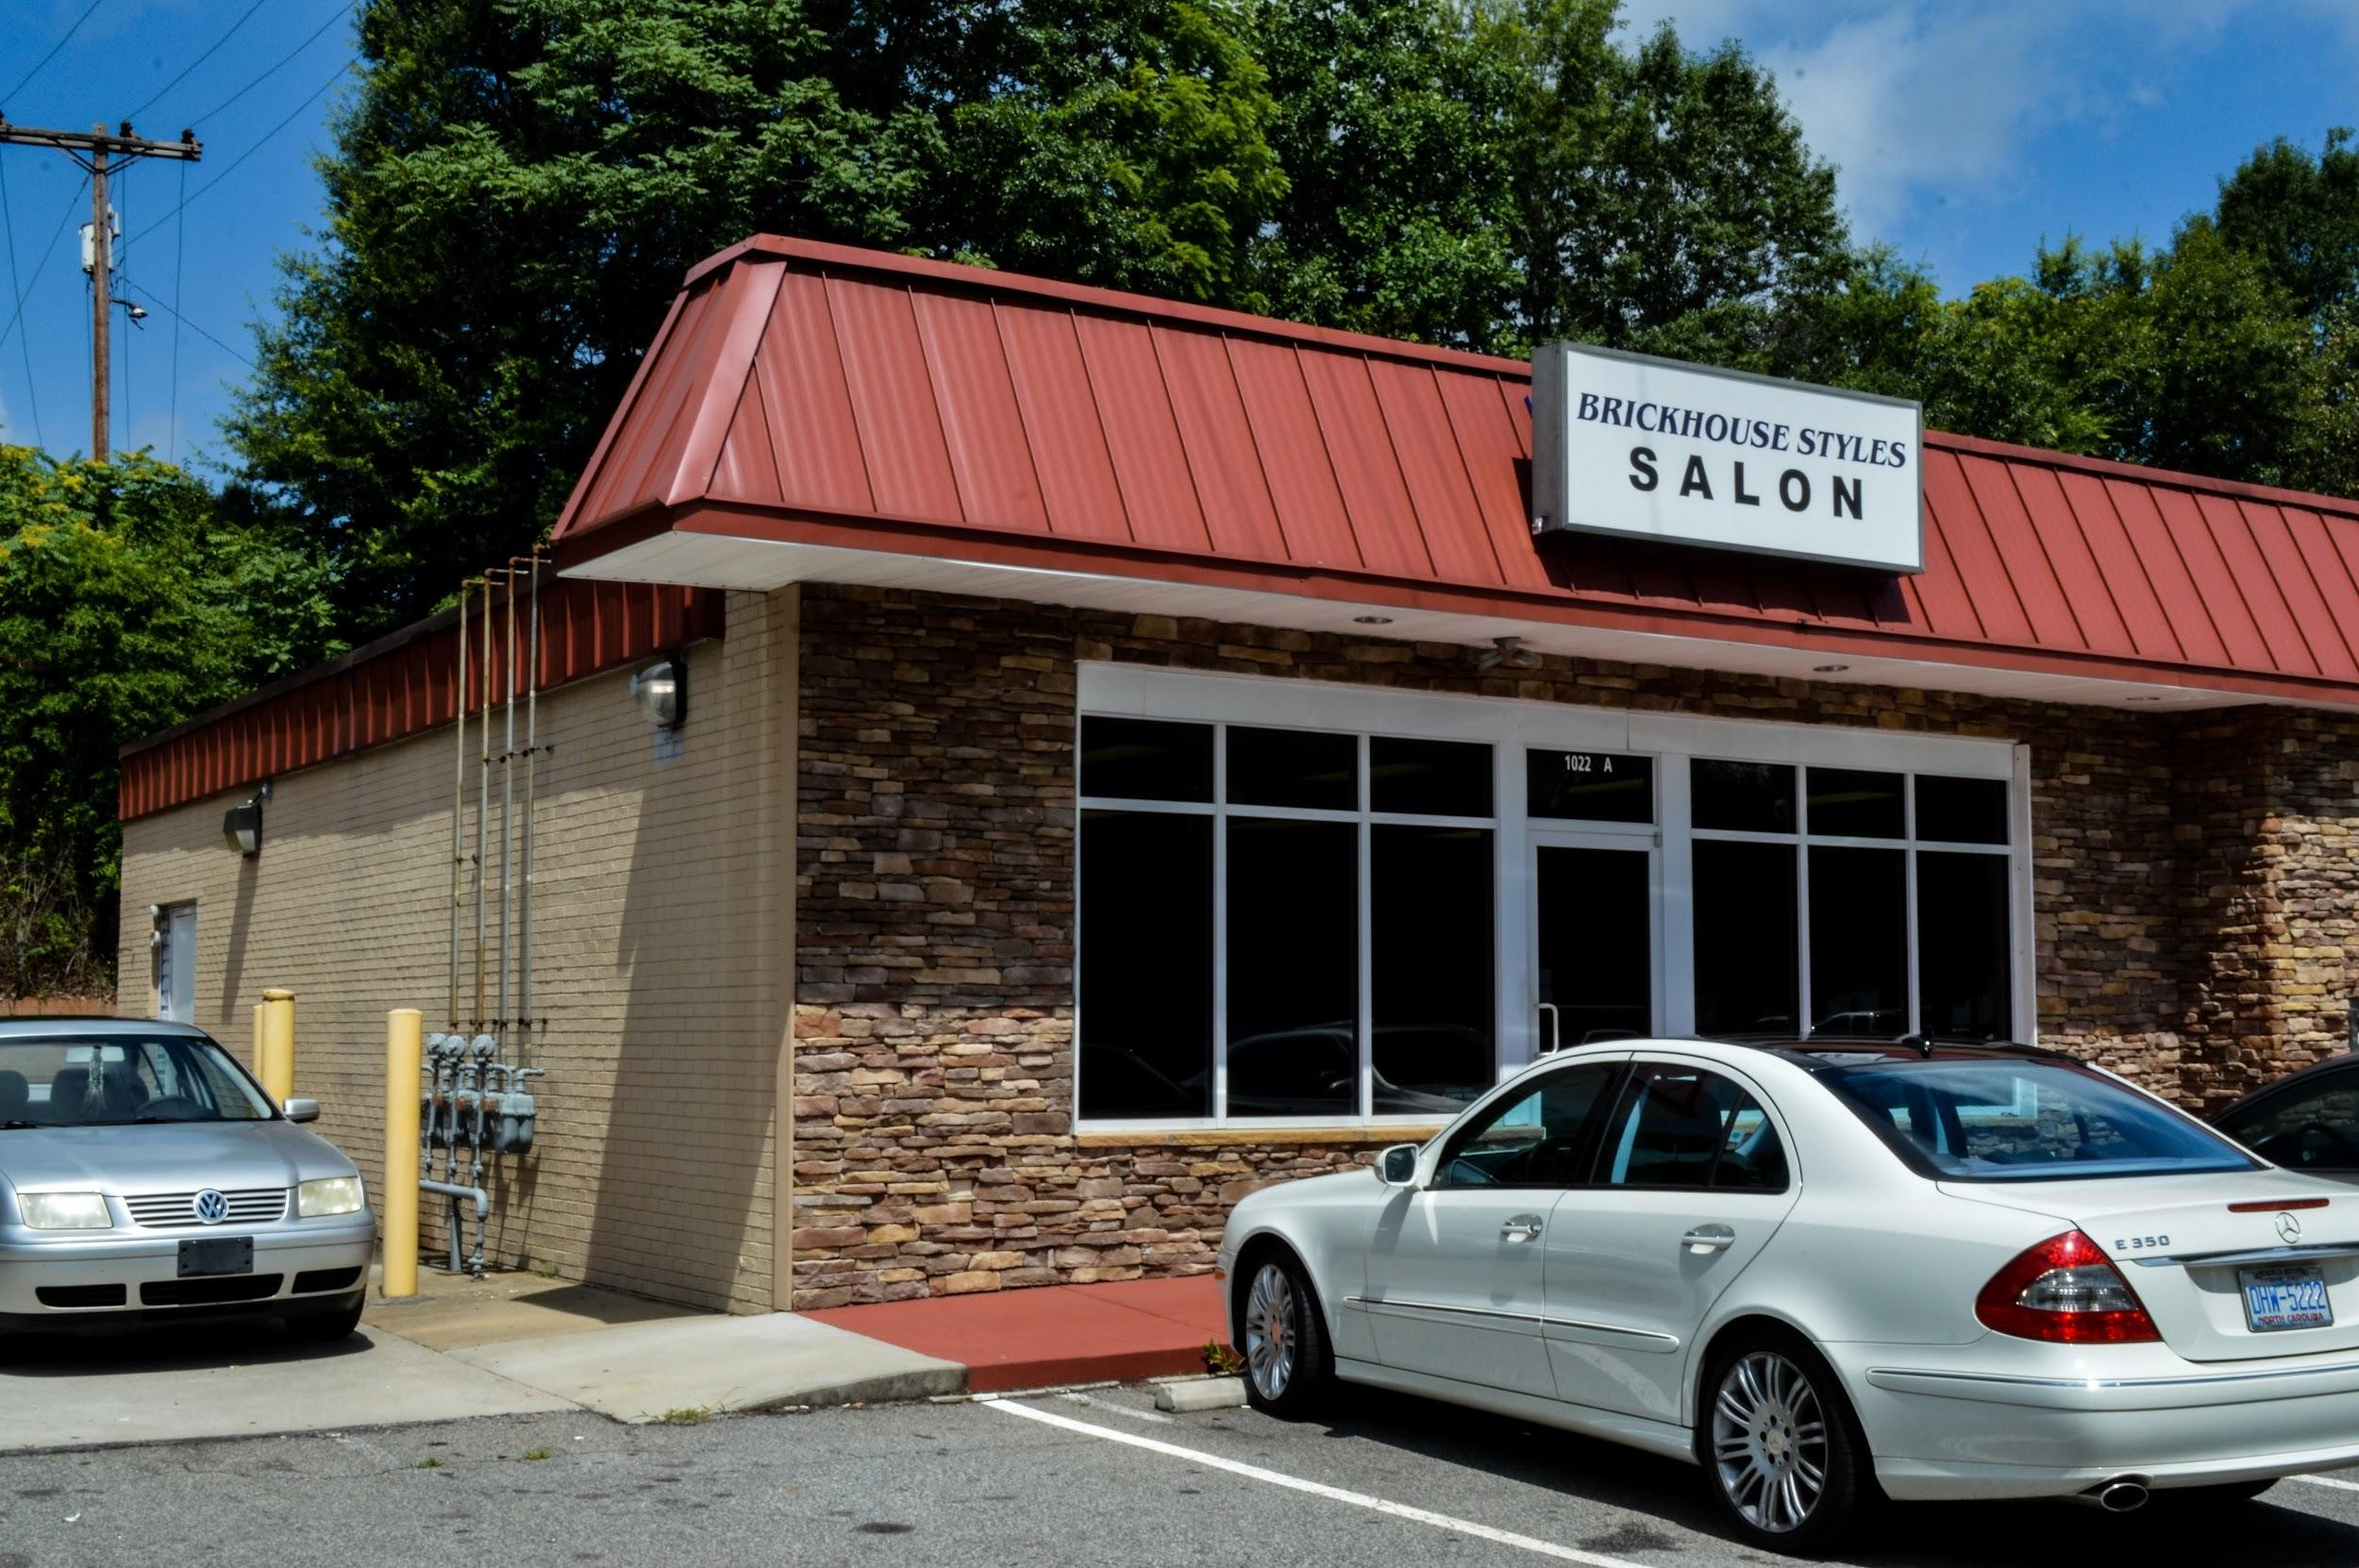 Brickhouse Styles Salon-Shoppes on Shelton